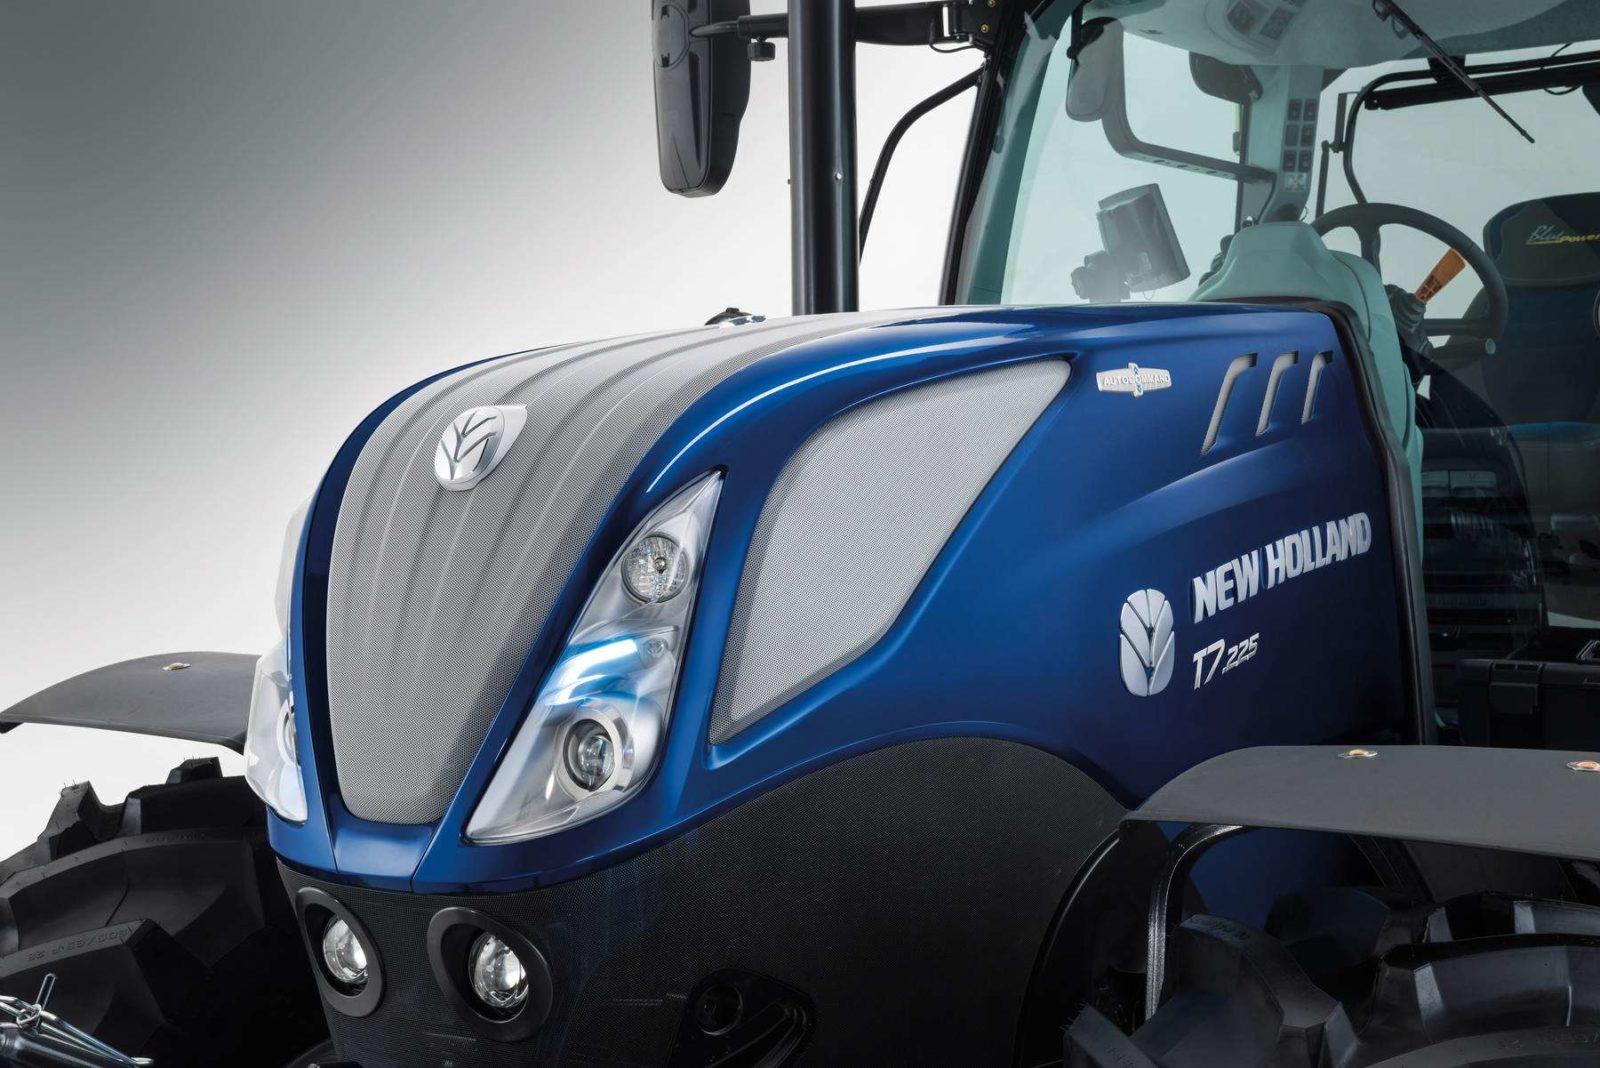 T7 225 Blue Power Autocommand Tier4 B 15 G 002